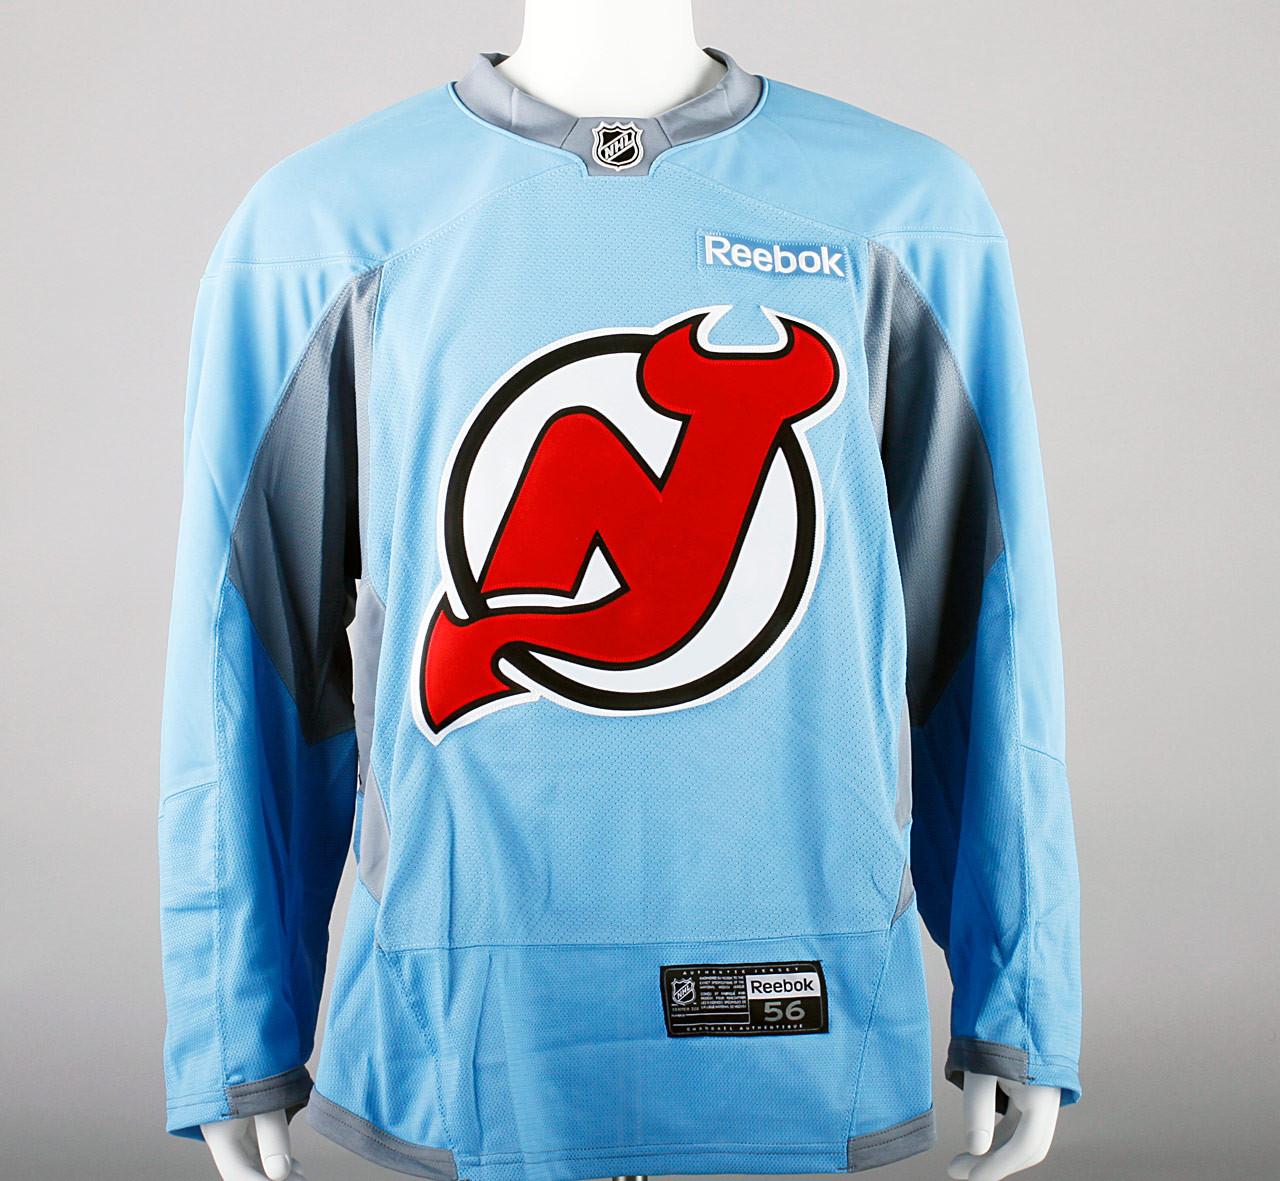 ... Practice Jersey - New Jersey Devils - Baby Blue Reebok Size 56  2.  Image 1 a62246782